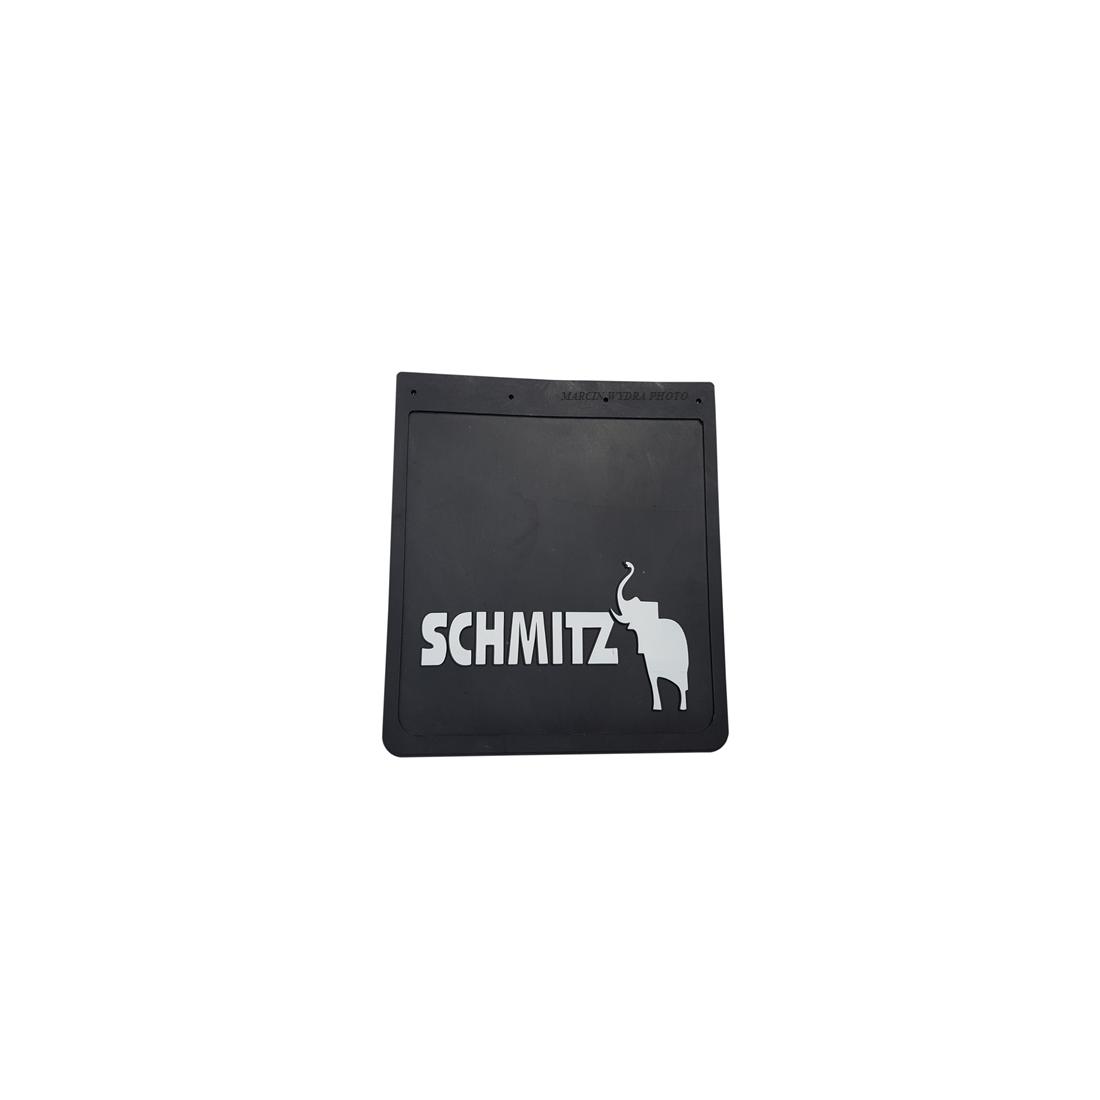 Mud flap SCHMITZ black - white 3D